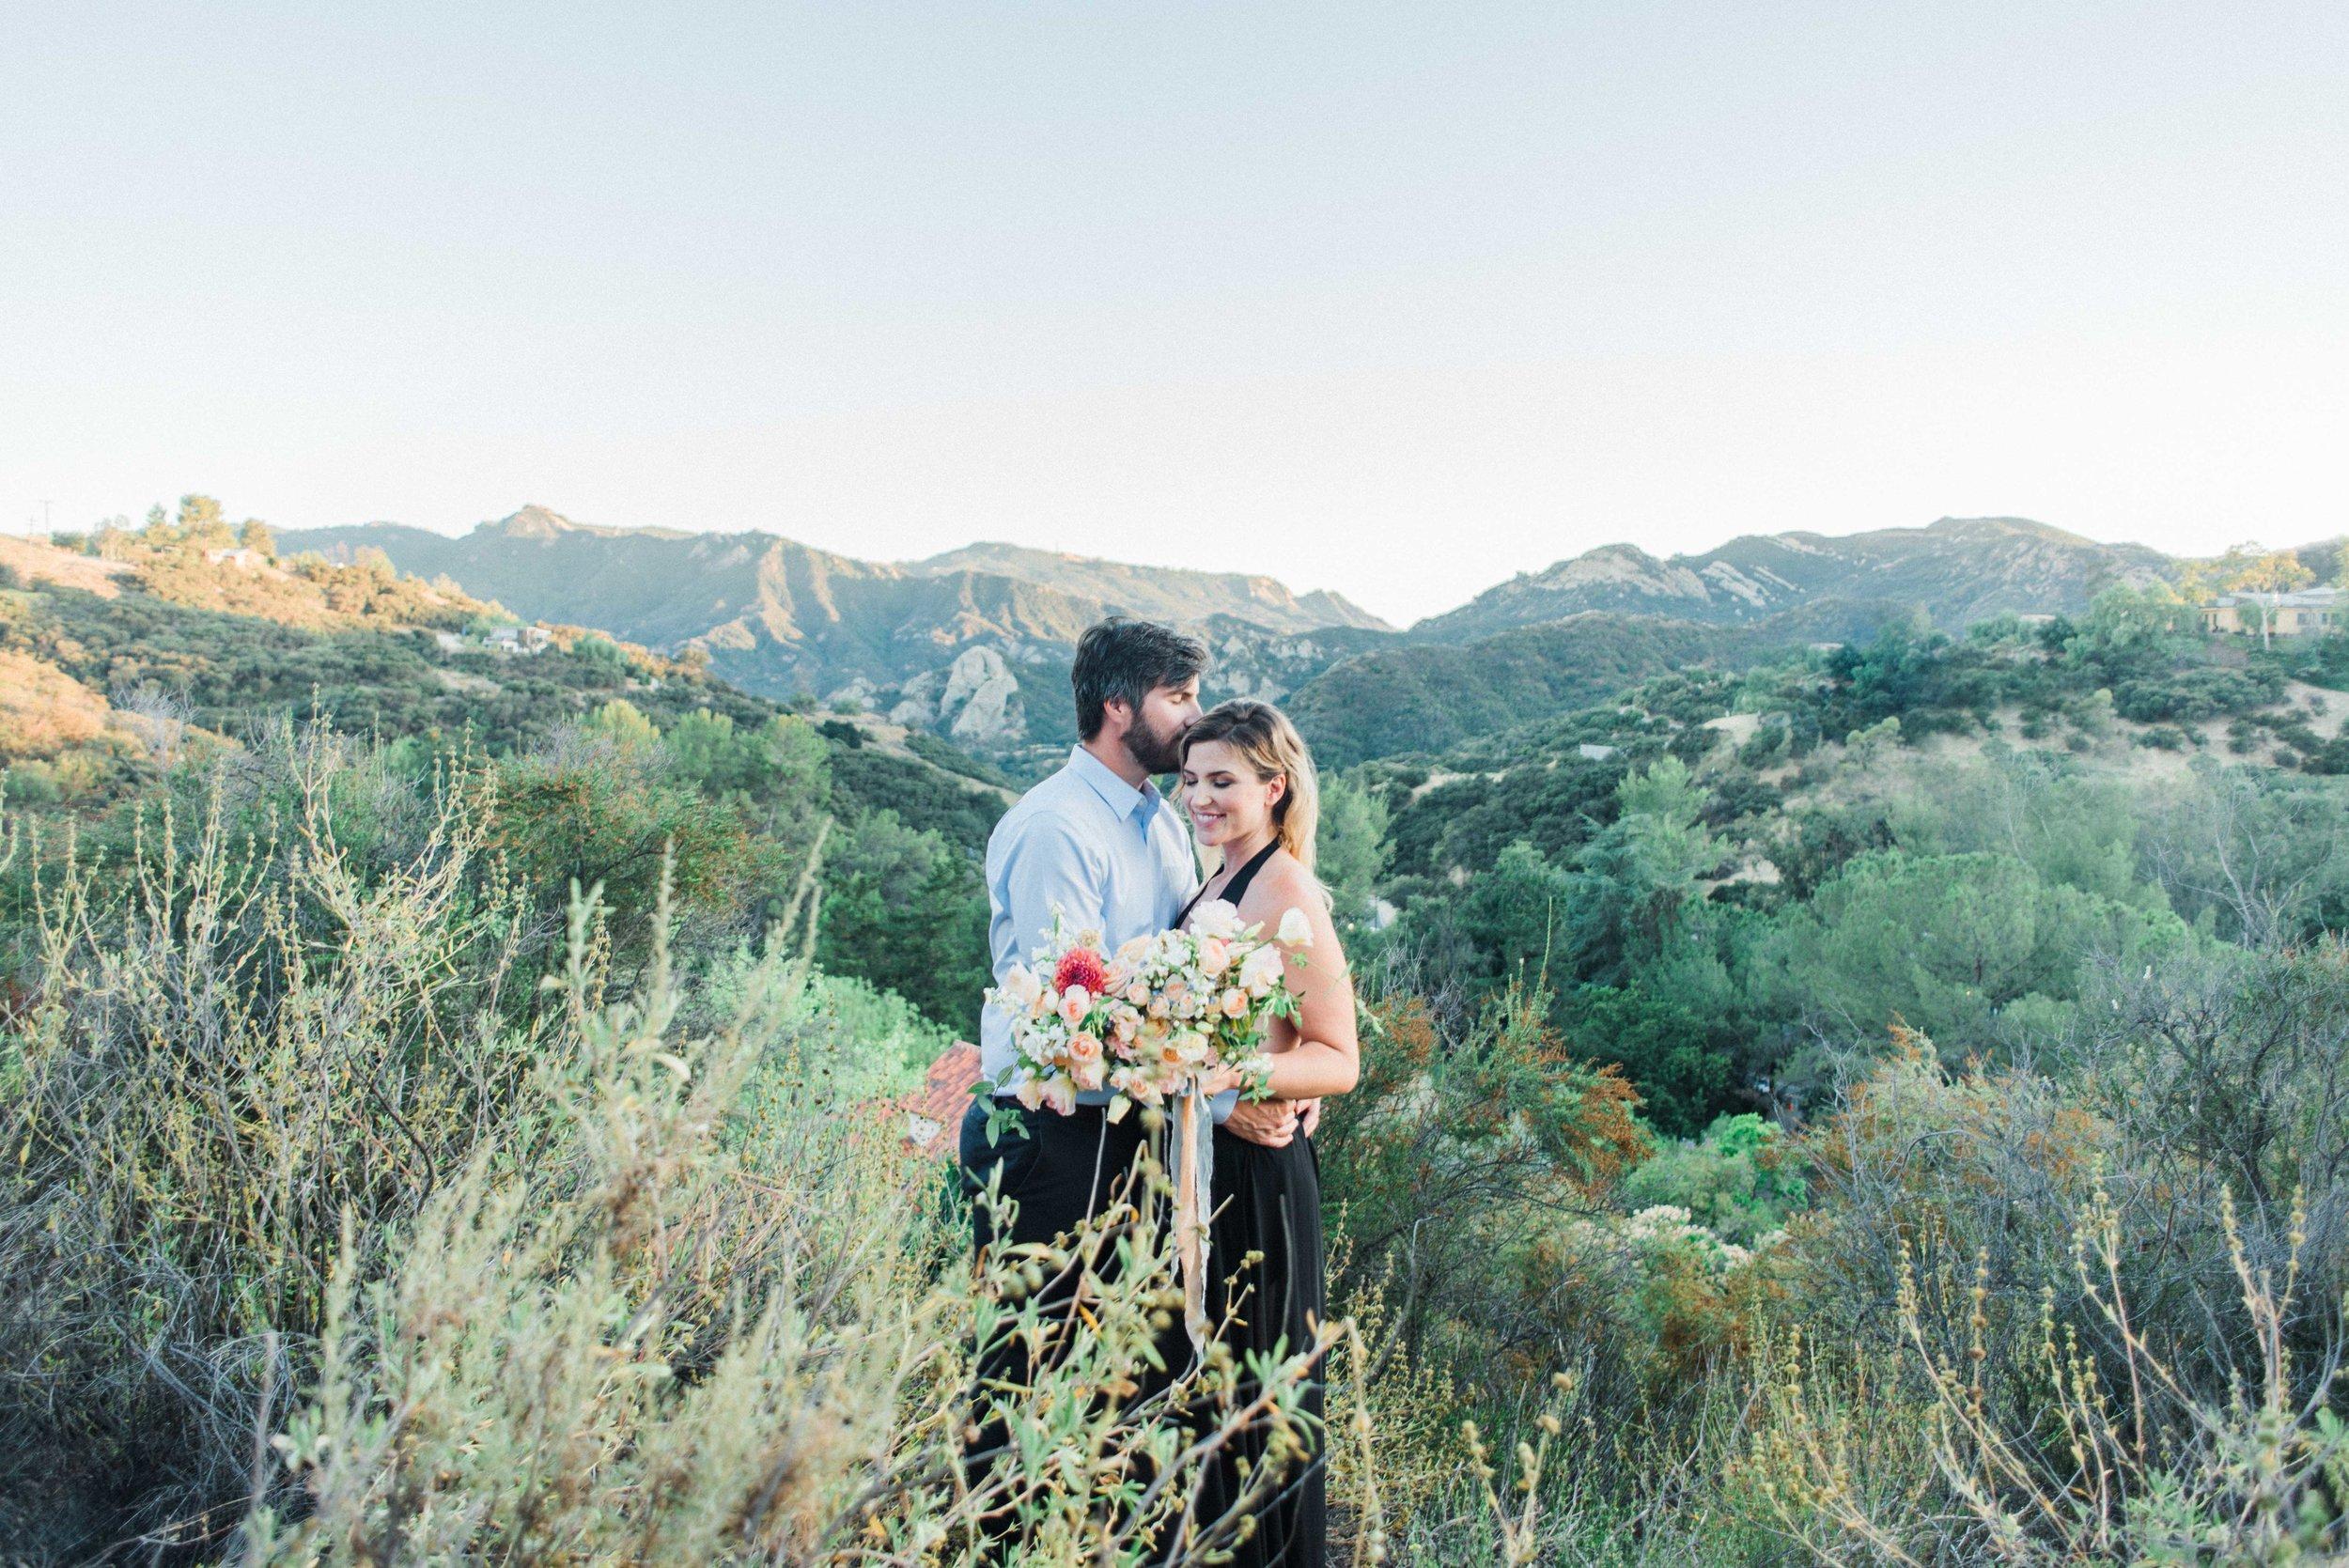 California_Engagement (33 of 50).jpg